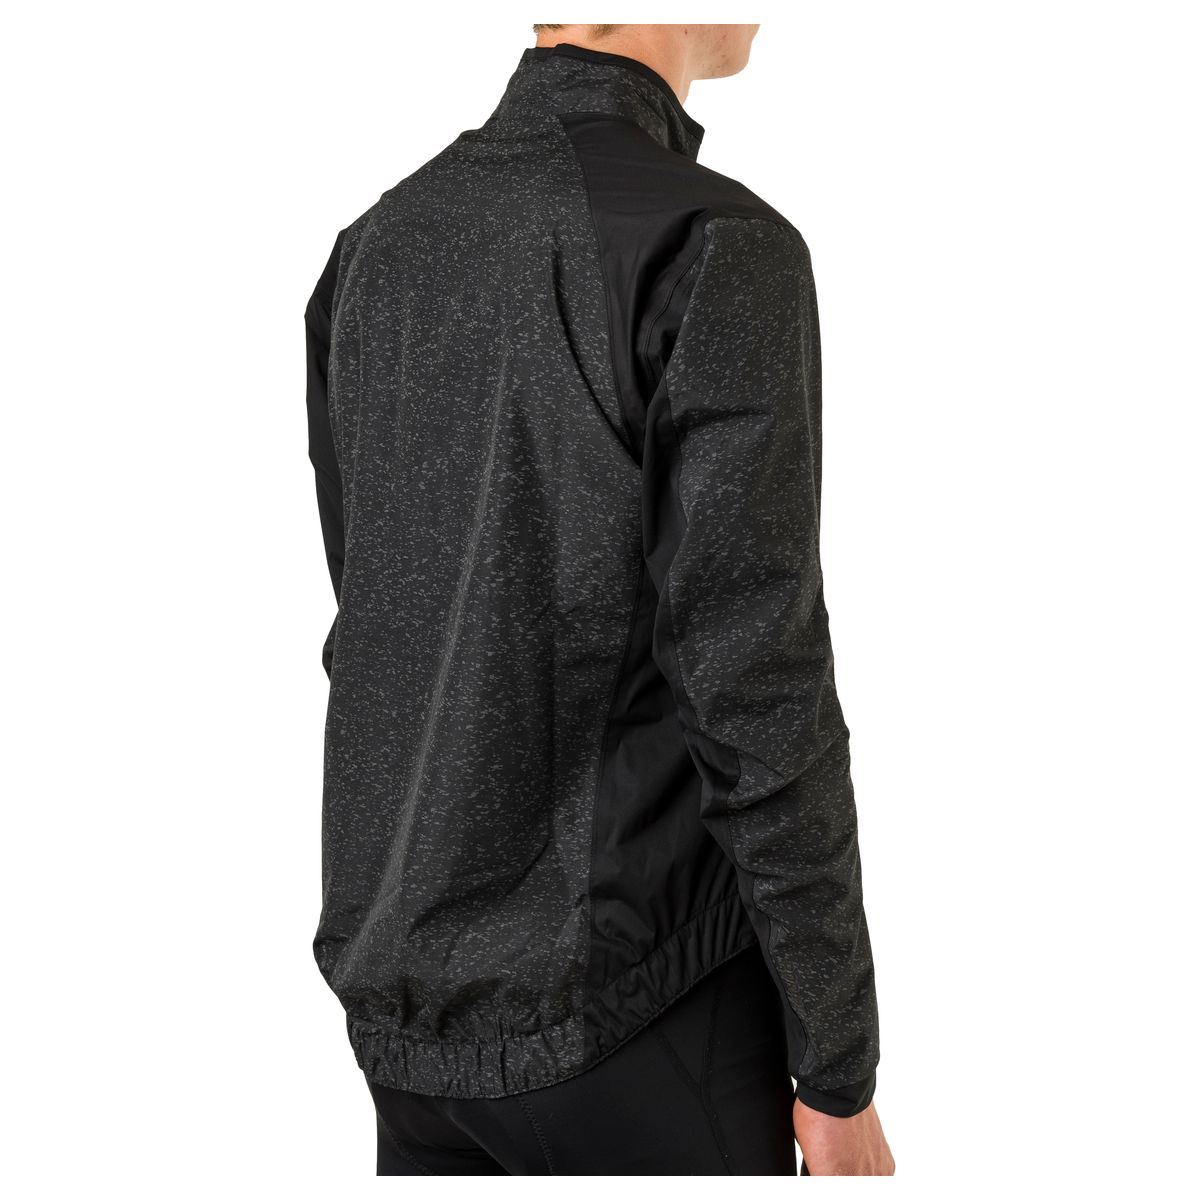 Hivis Rain Jacket Essential Men fit example